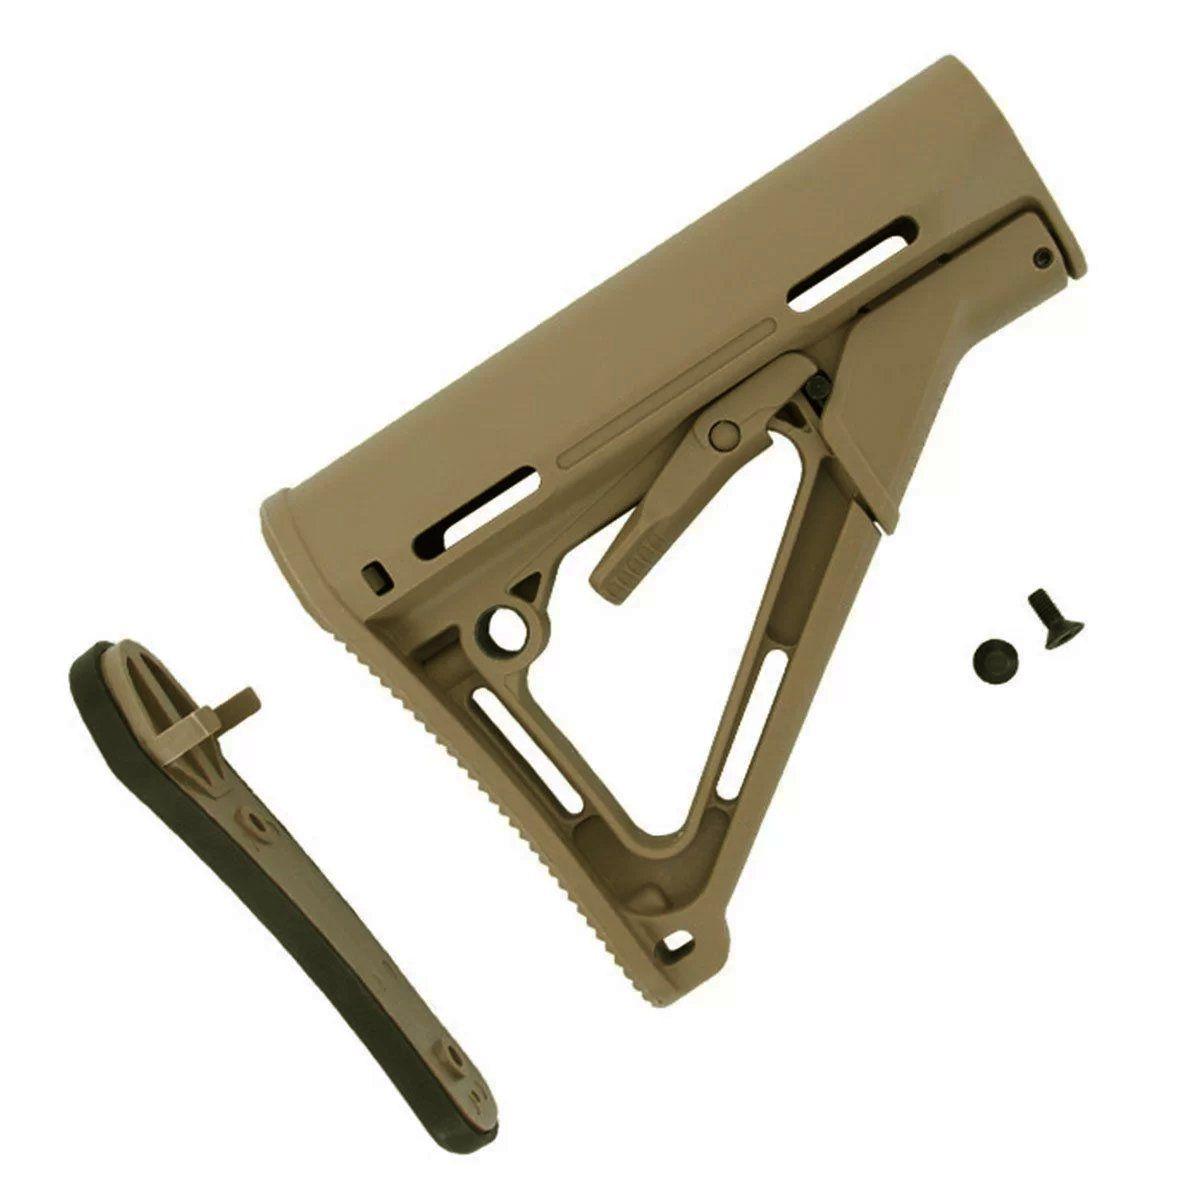 Coronha Para Rifles M4 Airsoft CTR - Tan